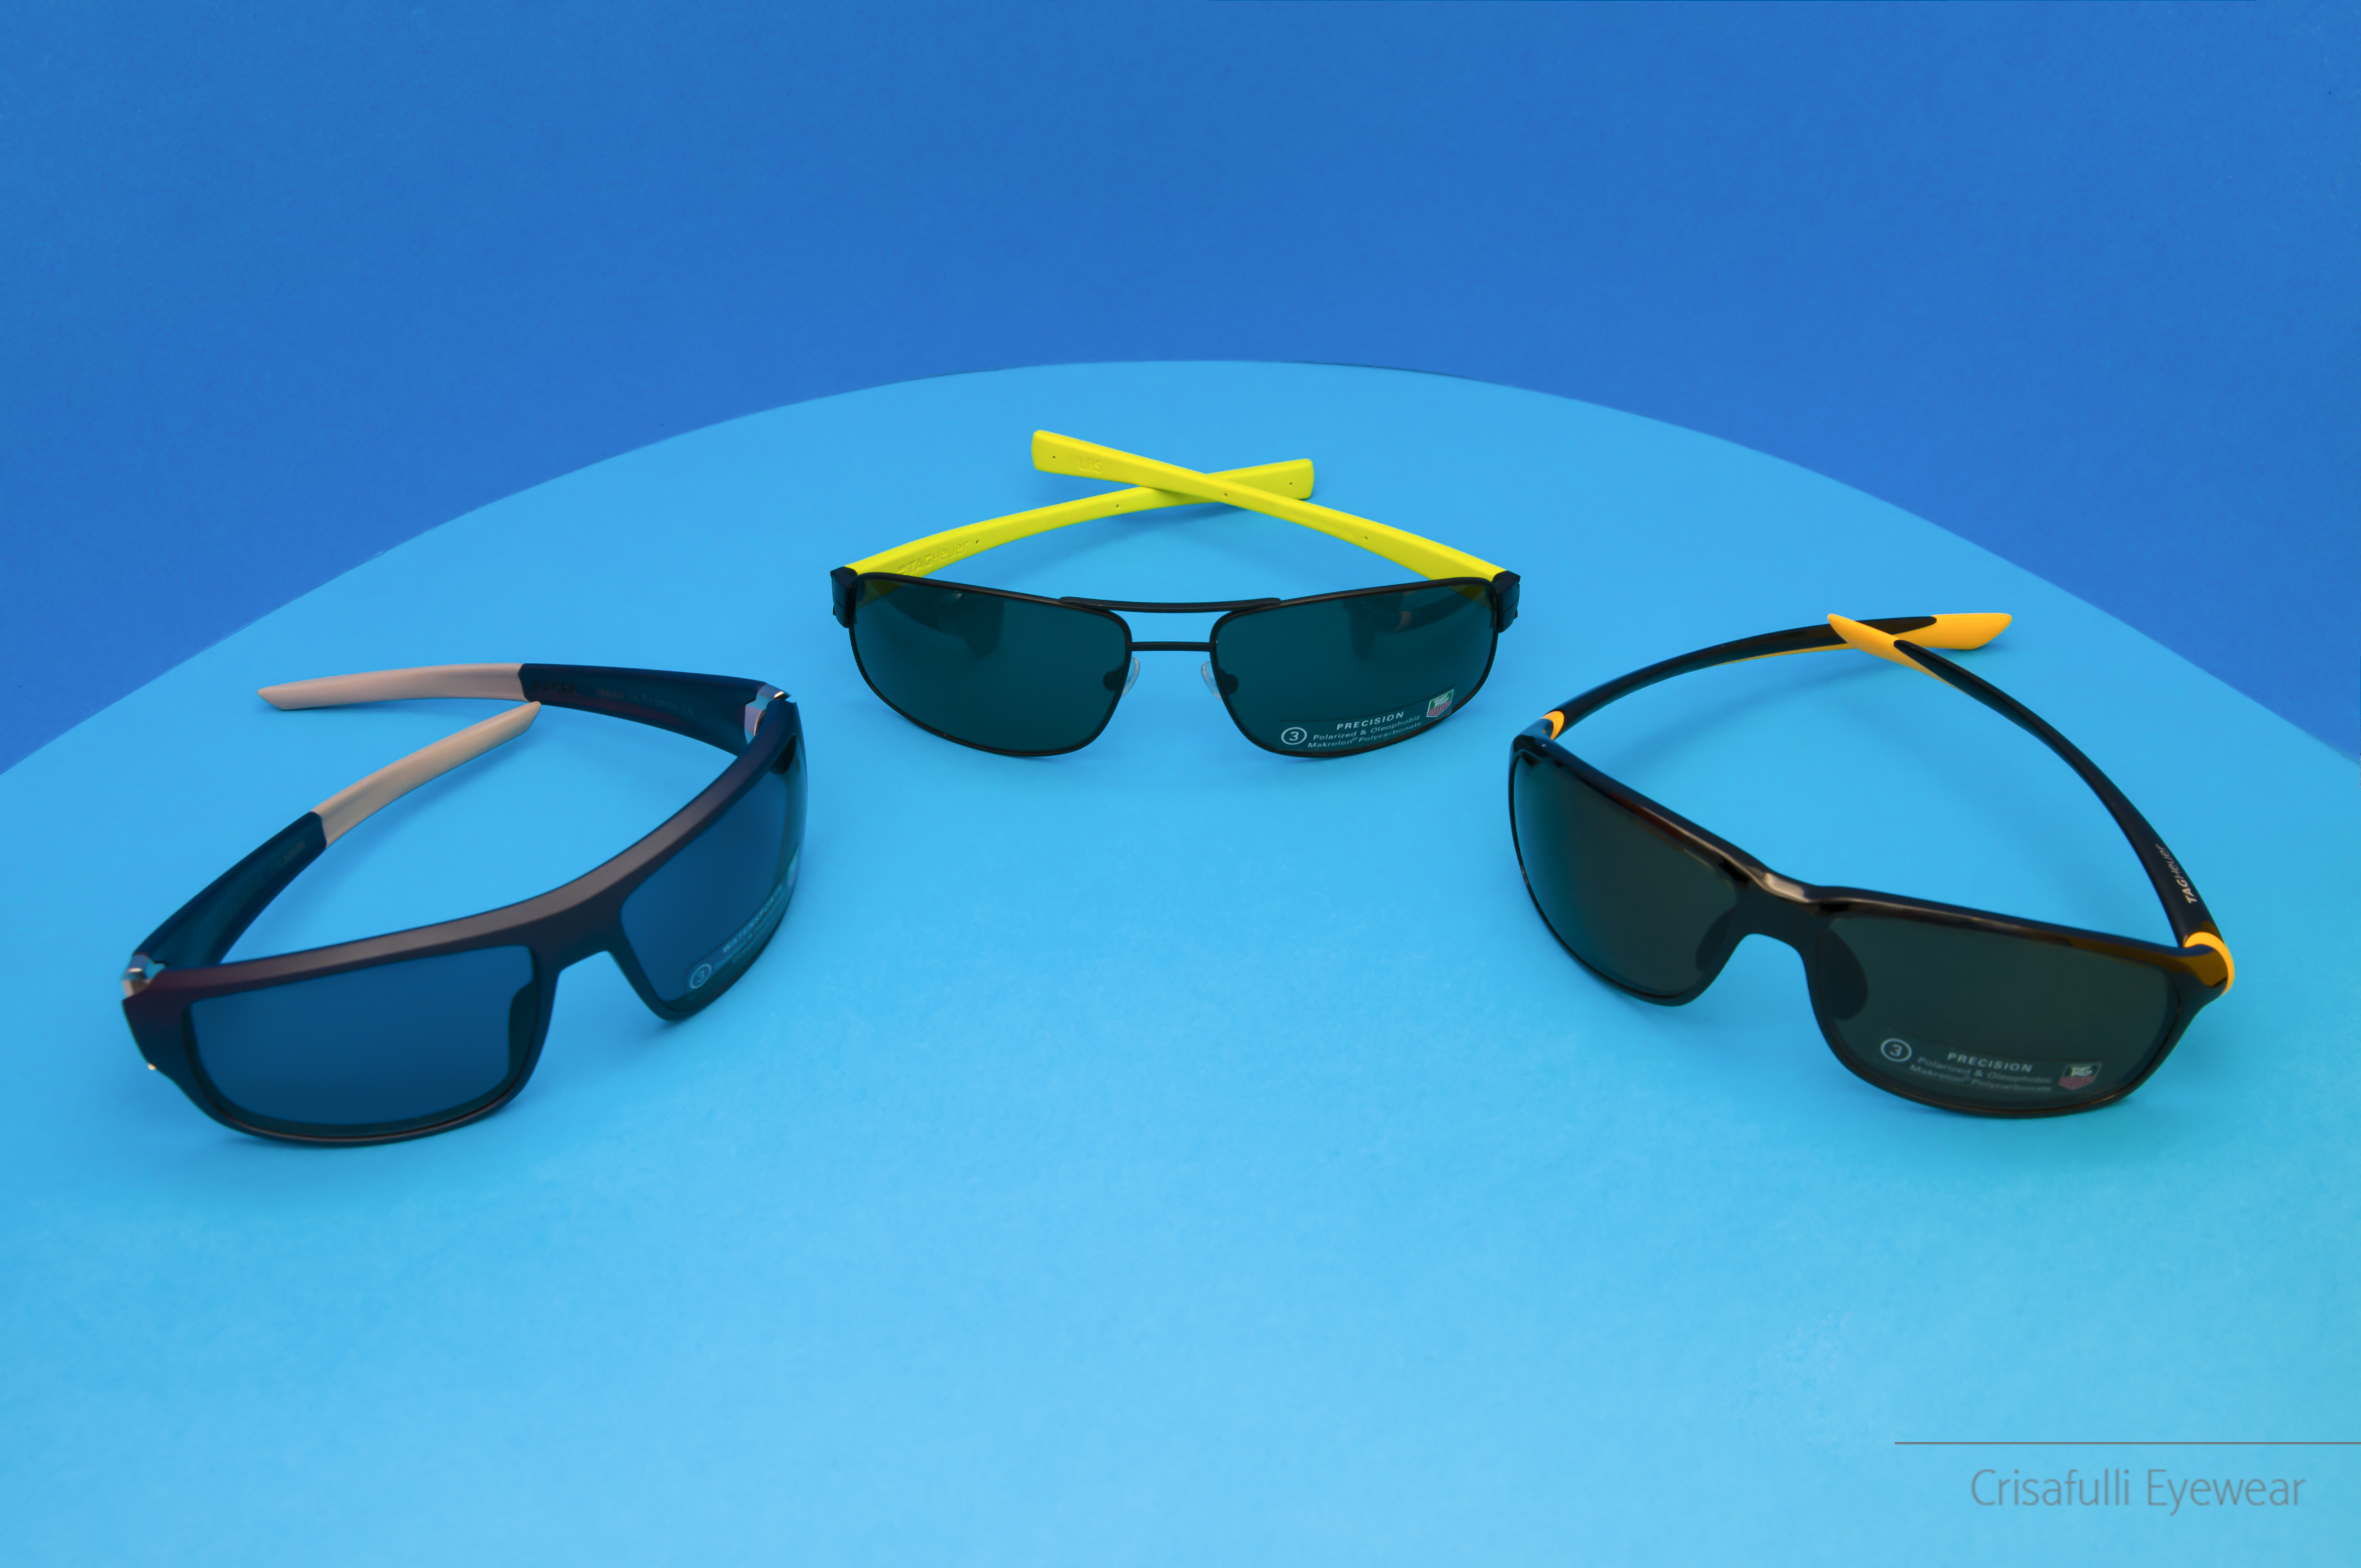 Crisafulli Eyewear - STARCK - Sunglasses